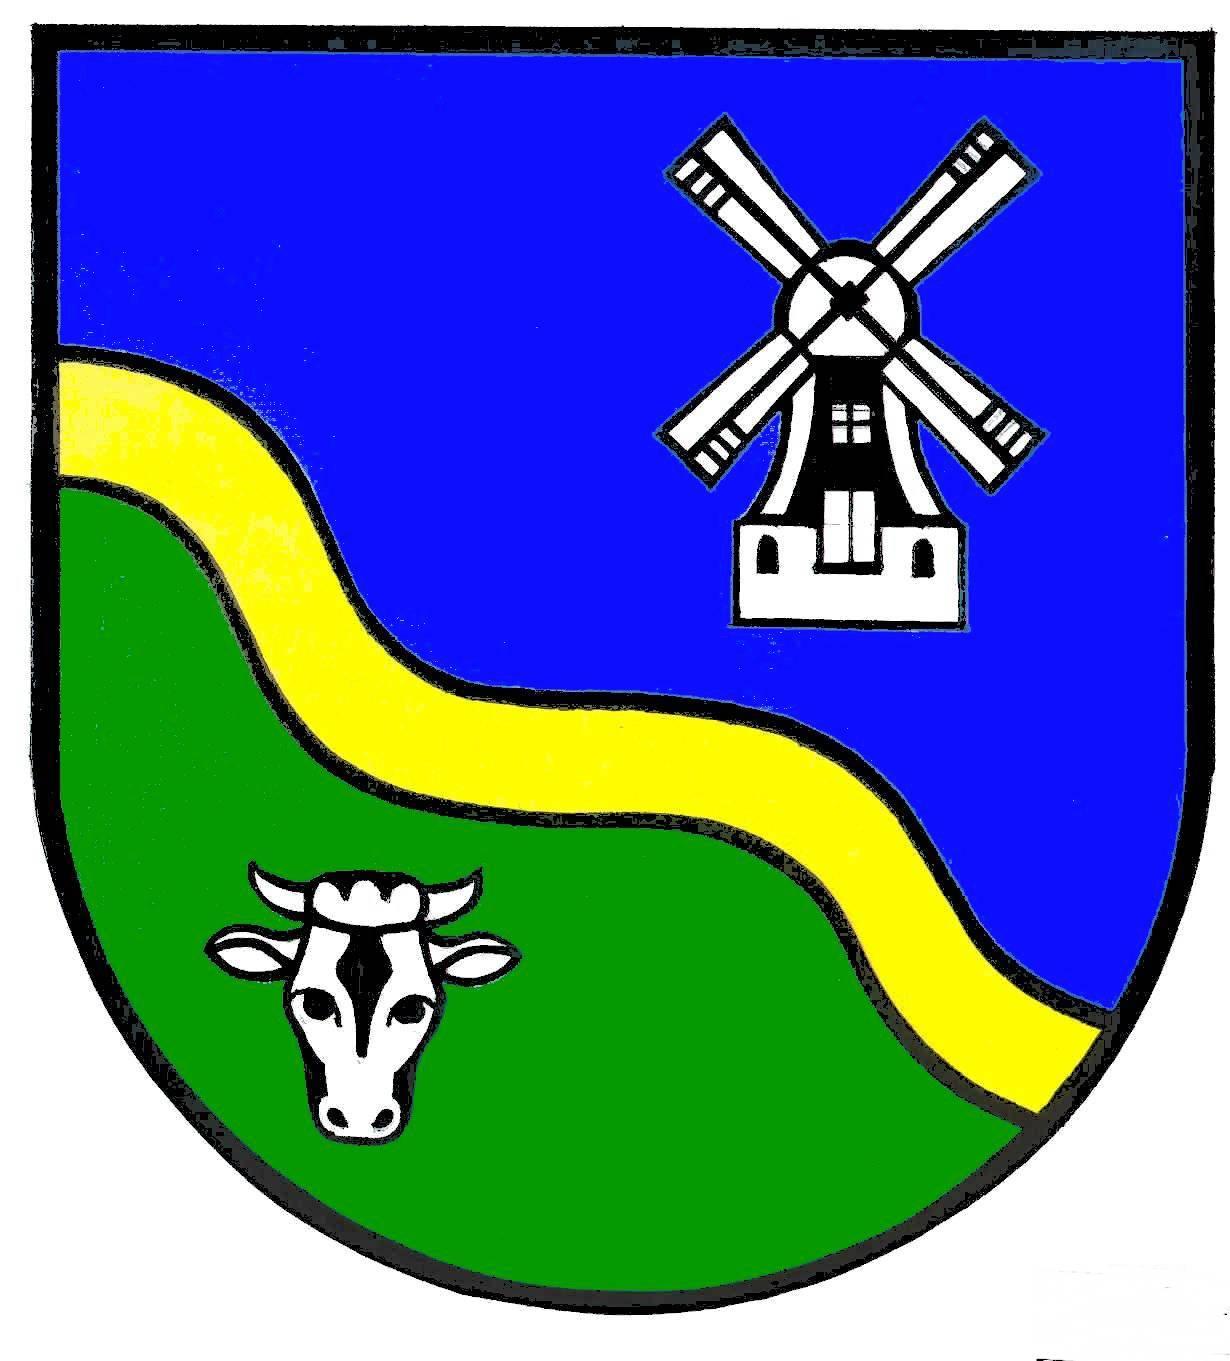 Wappen GemeindeGoldebek, Kreis Nordfriesland